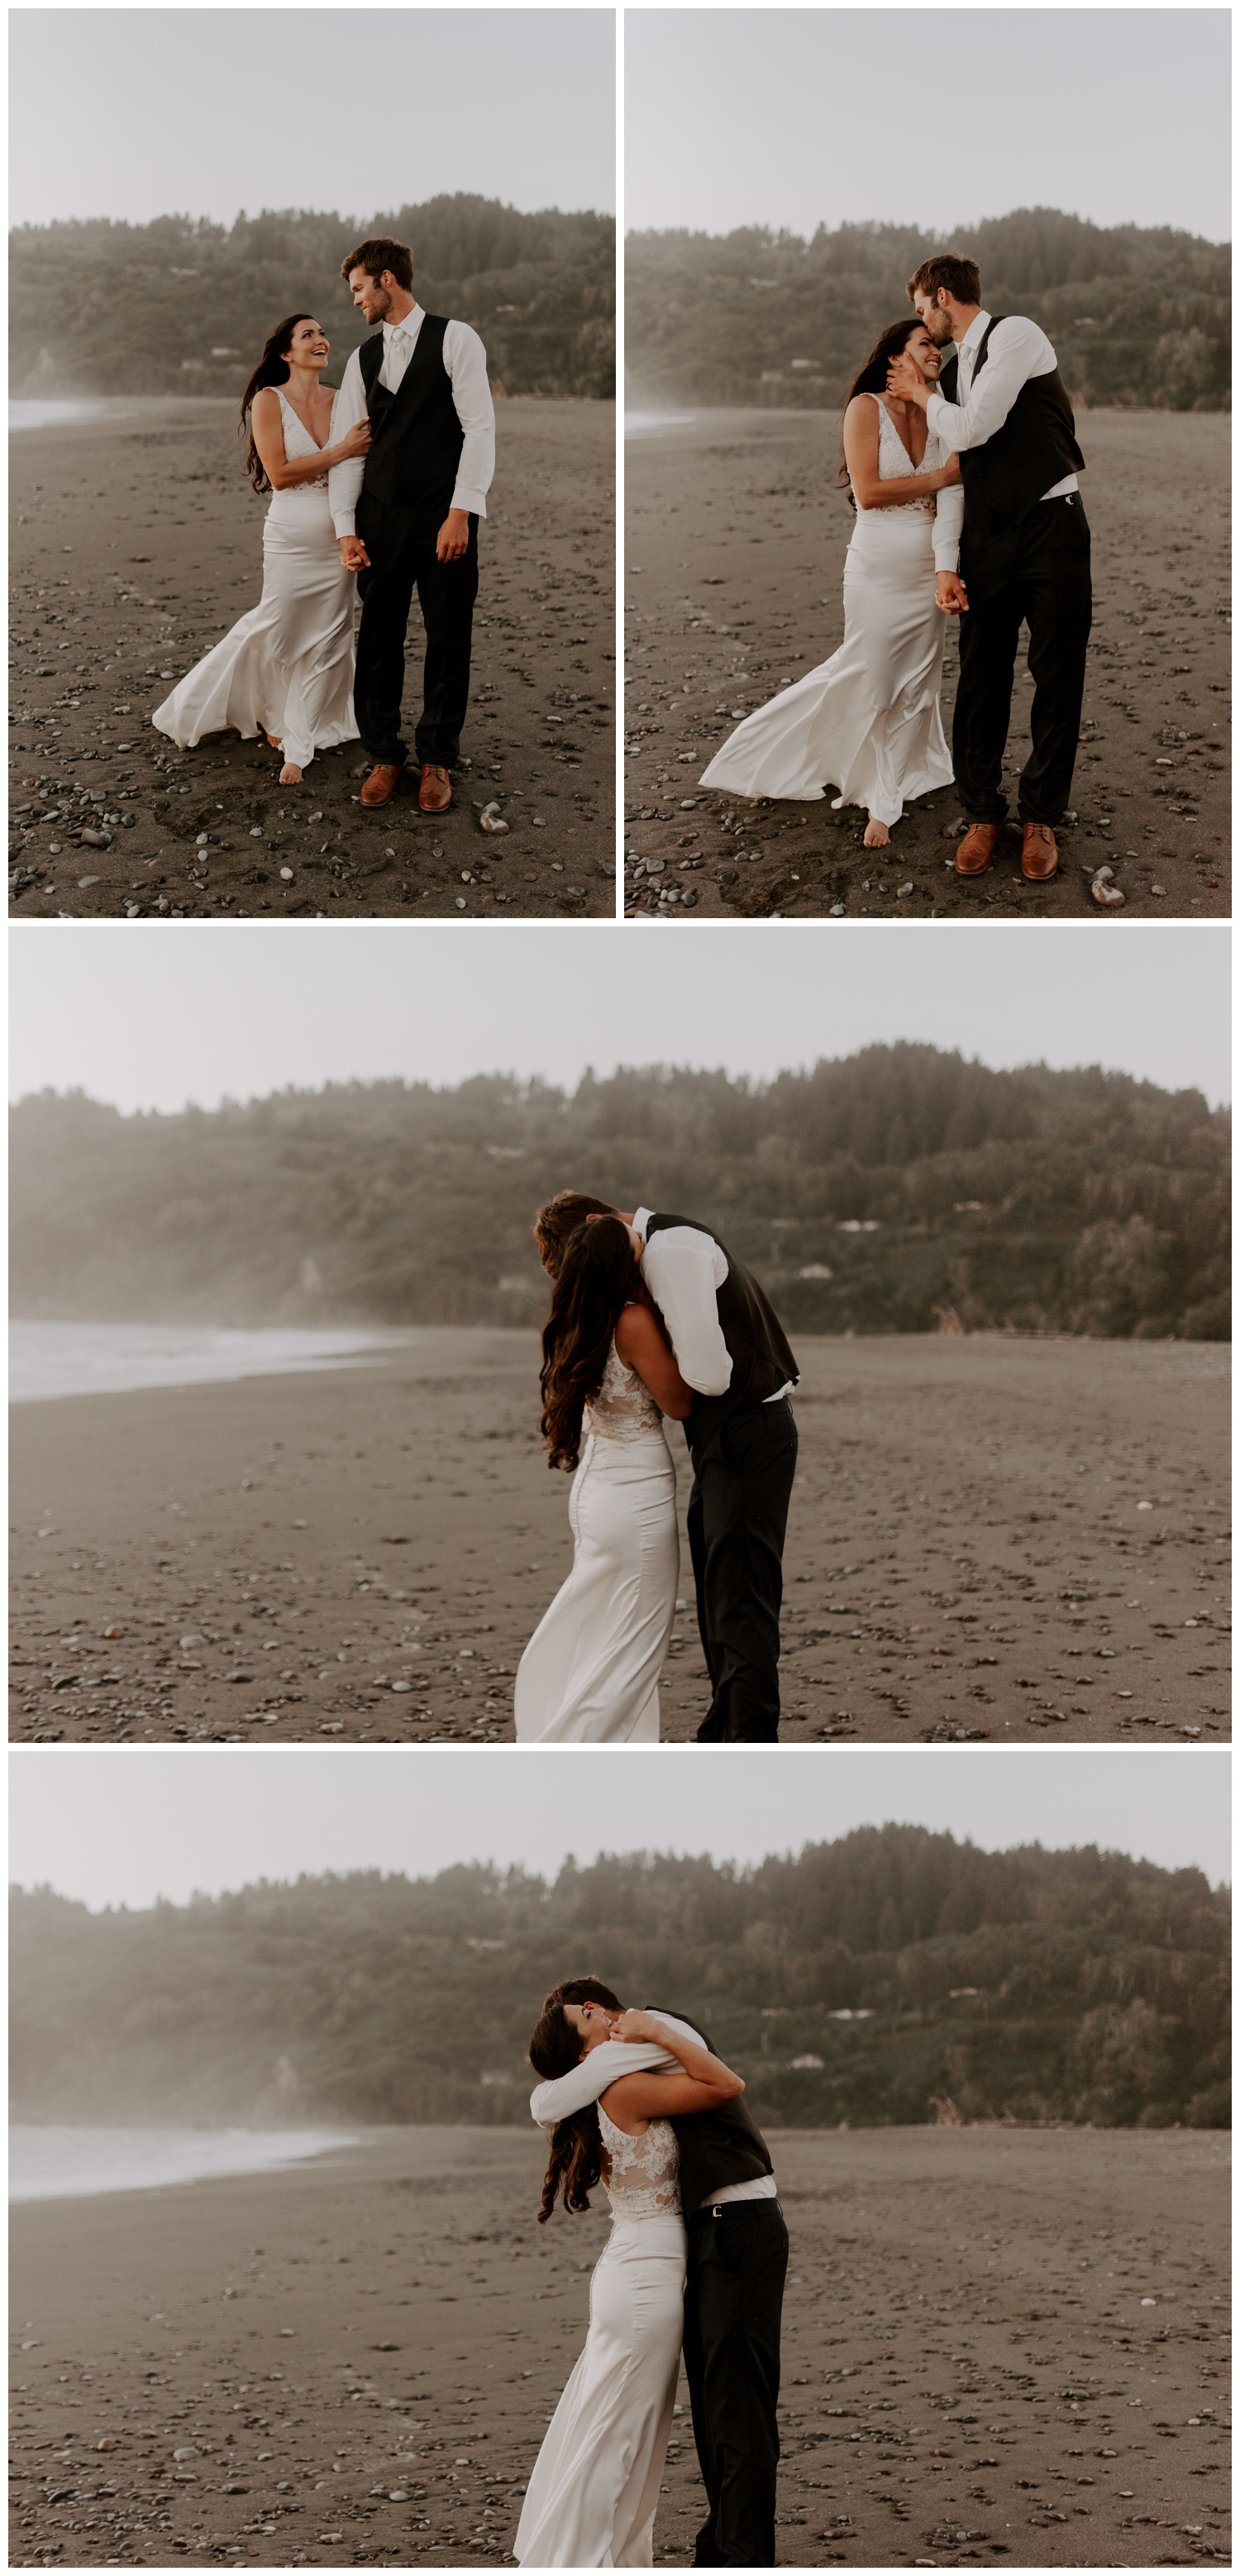 Klamath River Northern California Wedding - Oceana and Kenton - Jessica Heron Images 088.jpg